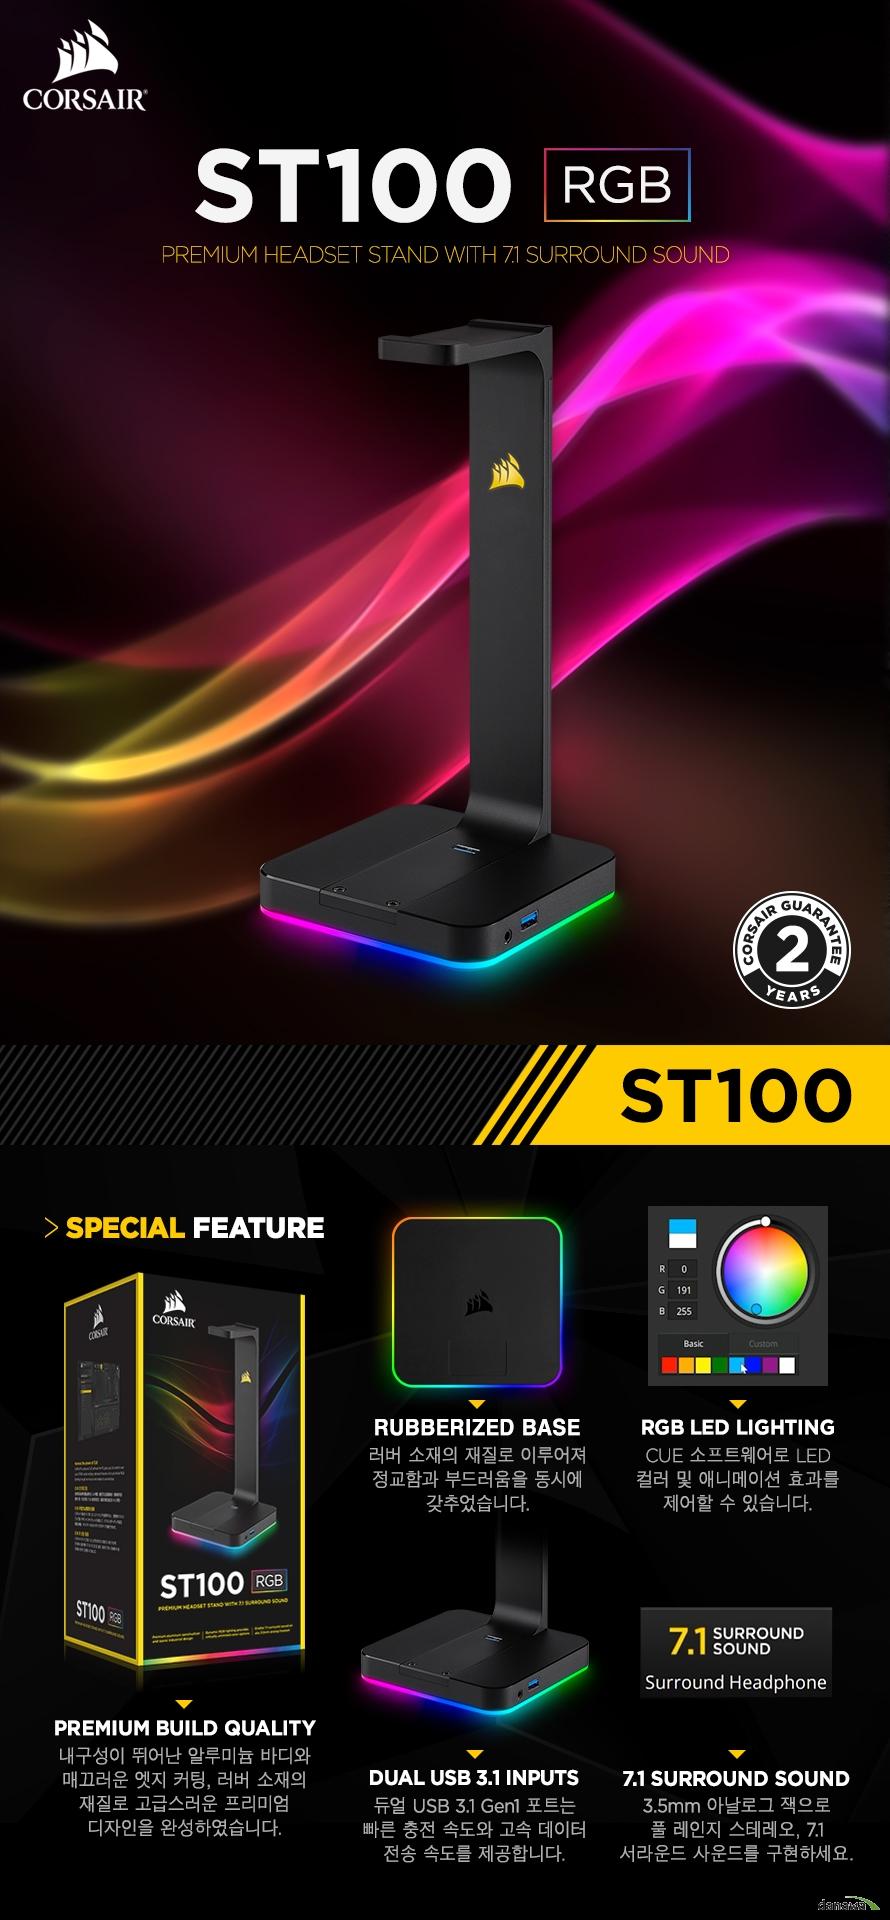 ST100 RGBPremium Headset Stand With 7.1 Surround SoundPremium Build Quality내구성이 뛰어난 알루미늄 바디와매끄러운 엣지 커팅, 러버 소재의재질로 고급스러운 프리미엄디자인을 완성하였습니다.Rubberized Base러버 소재의 재질로 이루어져정교함과 부드러움을 동시에갖추었습니다.RGB LED LIGHTINGCUE 소프트웨어로 LED컬러 및 애니메이션 효과를제어할 수 있습니다.Dual USB 3.1 inputs듀얼 USB 3.1 Gen1 포트는빠른 충전 속도와 고속 데이터전송 속도를 제공합니다.7.1 Surround Sound3.5mm 아날로그 잭으로풀 레인지 스테레오, 7.1서라운드 사운드를 구현하세요.